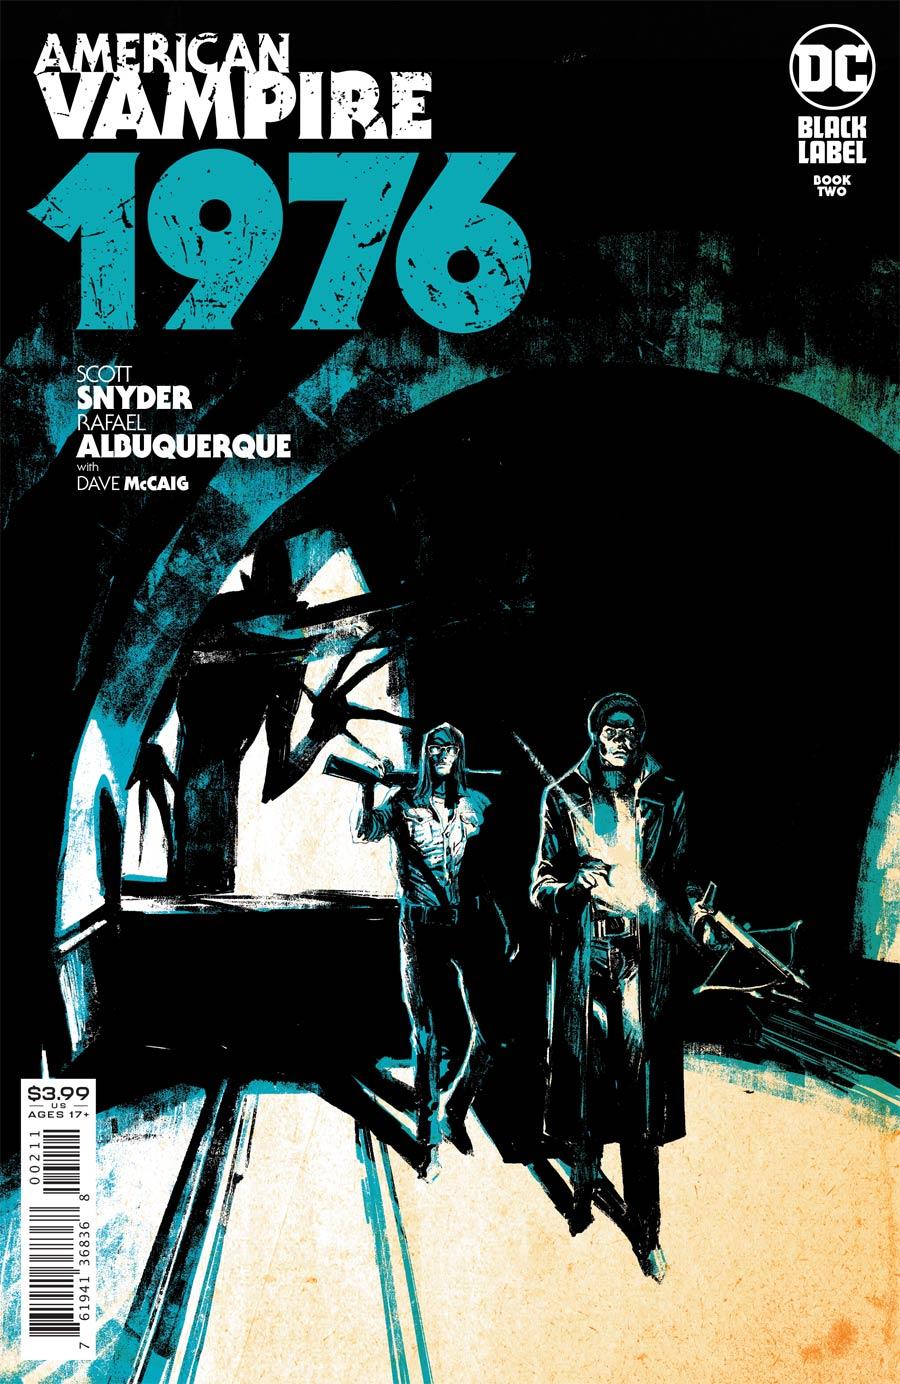 American Vampire 1976 #2 Cover A Regular Rafael Albuquerque Cover